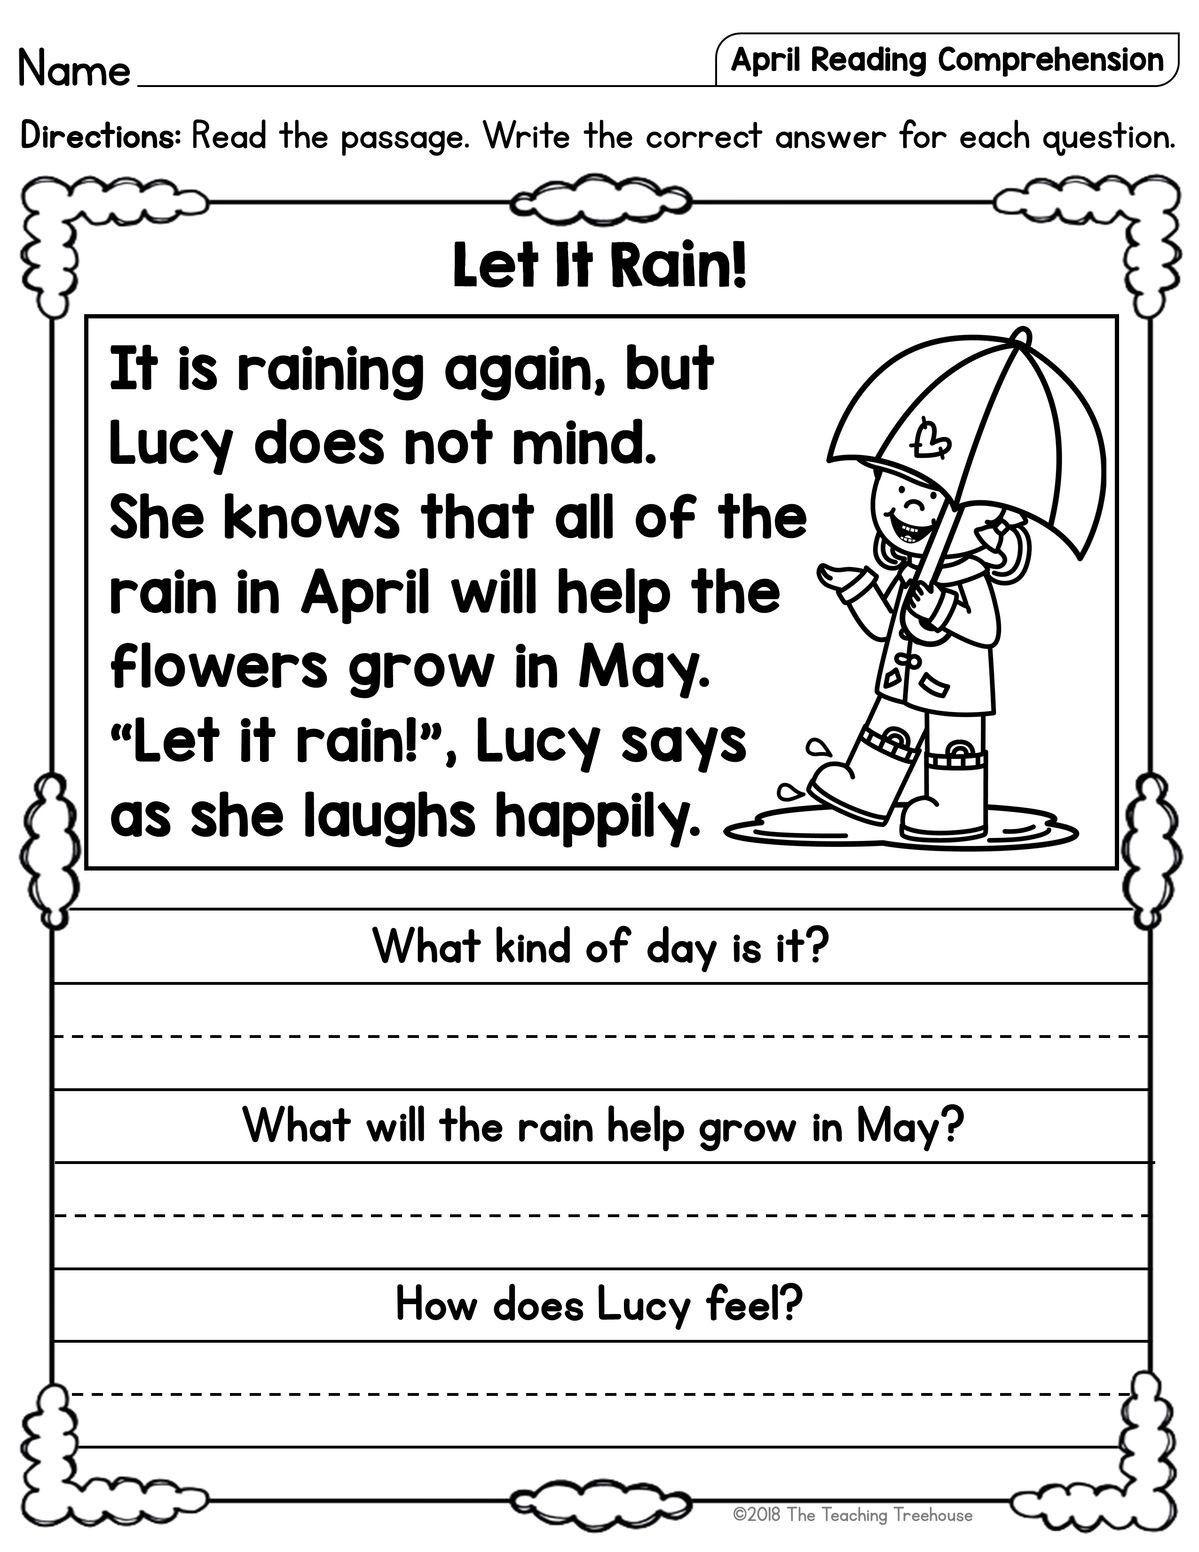 Pin by Amy Bowen on Preschool spring in 2020 Reading